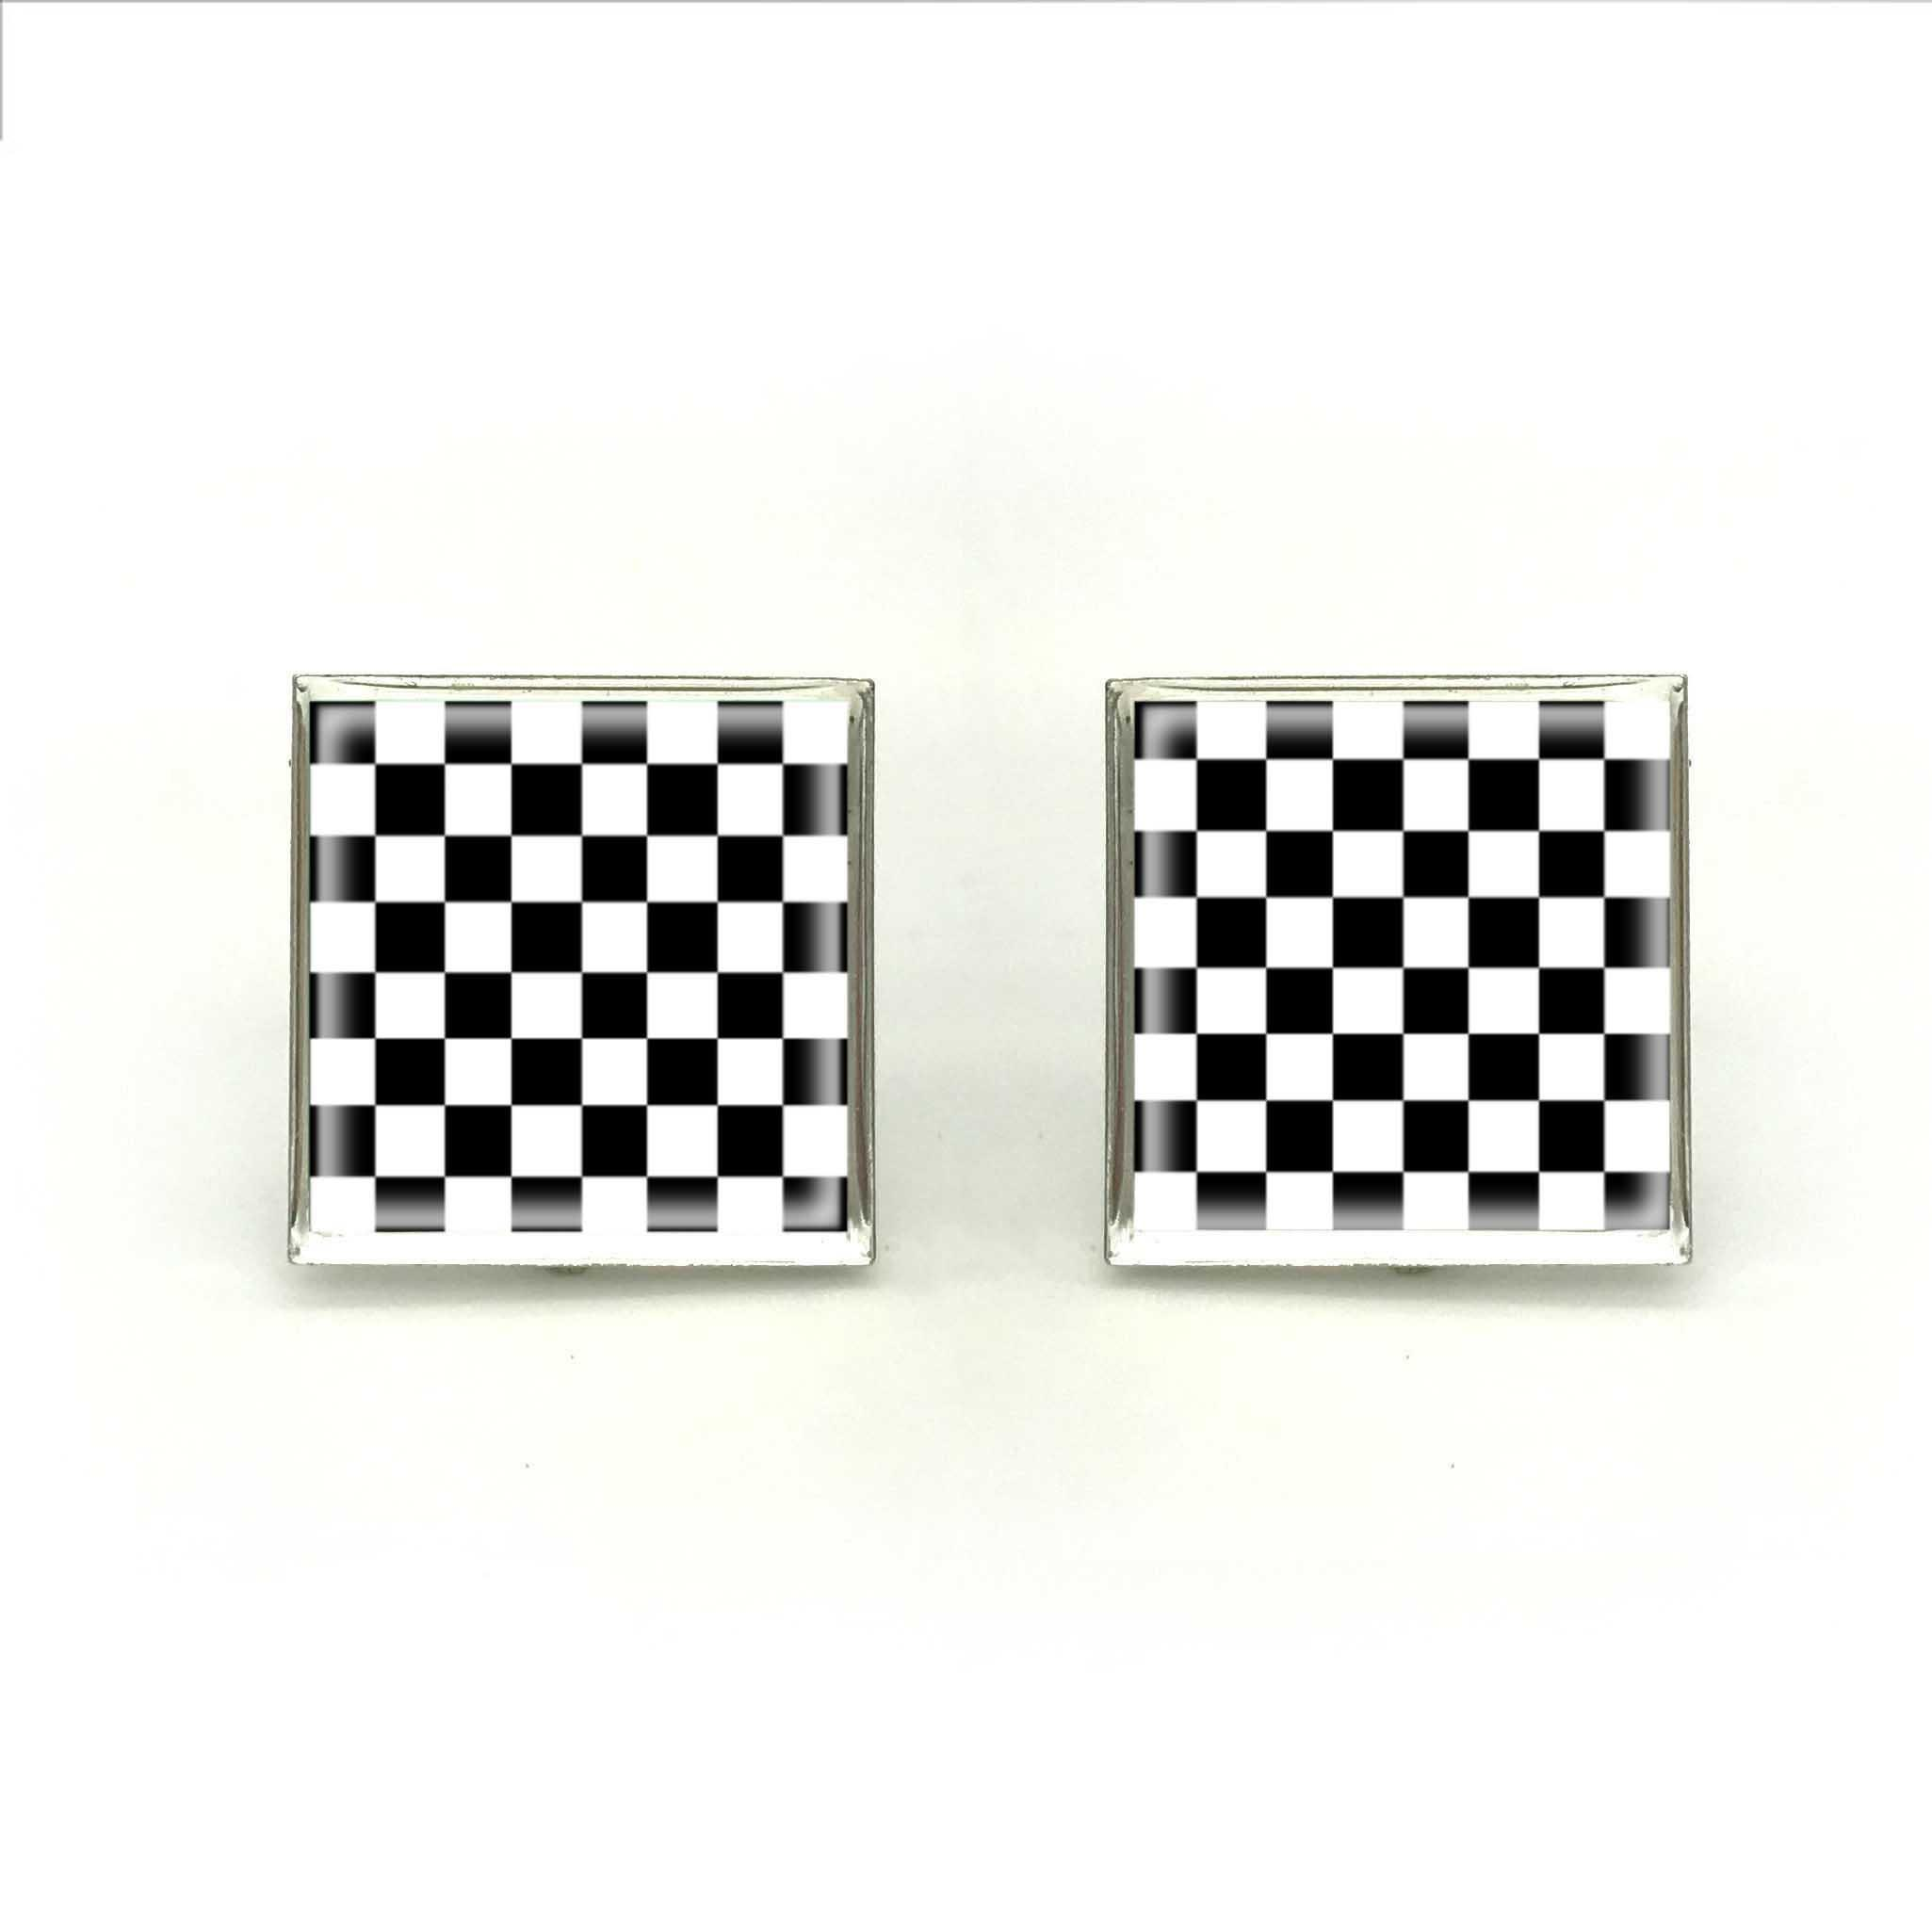 90a6d48e86a6 2019 2018 New Checkerboard Cufflink Chess Board Cufflinks Black And White  Square Cuff For Mens Silver Handmade Jewelry Glass Cuffs From  Jason19861229, ...